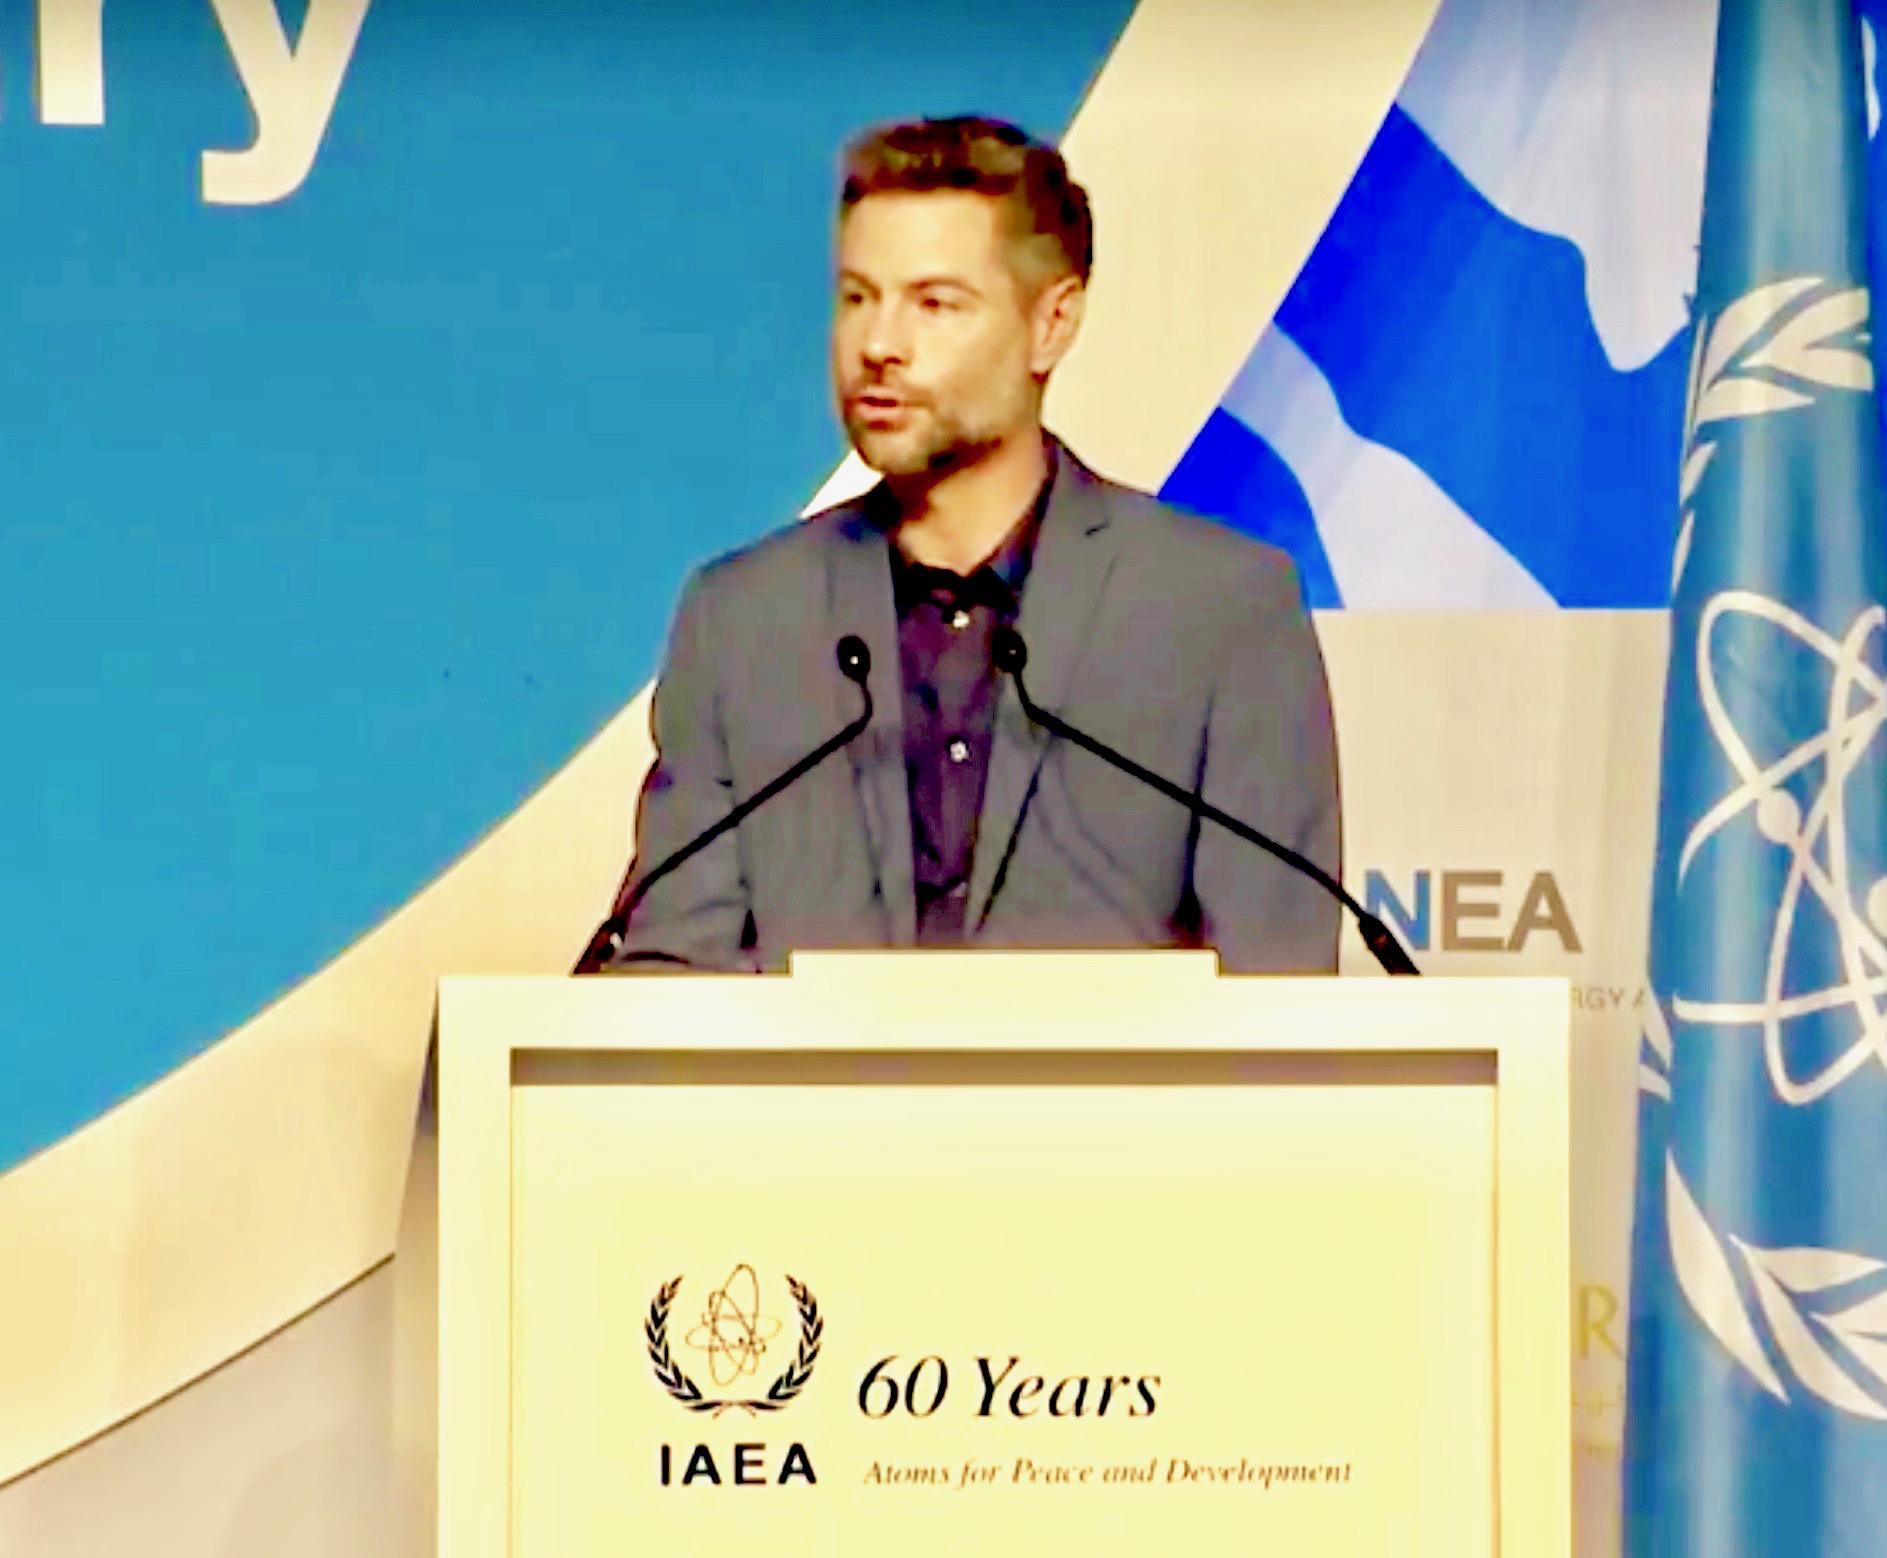 """ As-salāmu  ʿ alaykum."" EP President Michael Shellenberger addressing IAEA quadrennial inter-ministerial in Abu Dhabi, United Arab Emirates (UAE)"